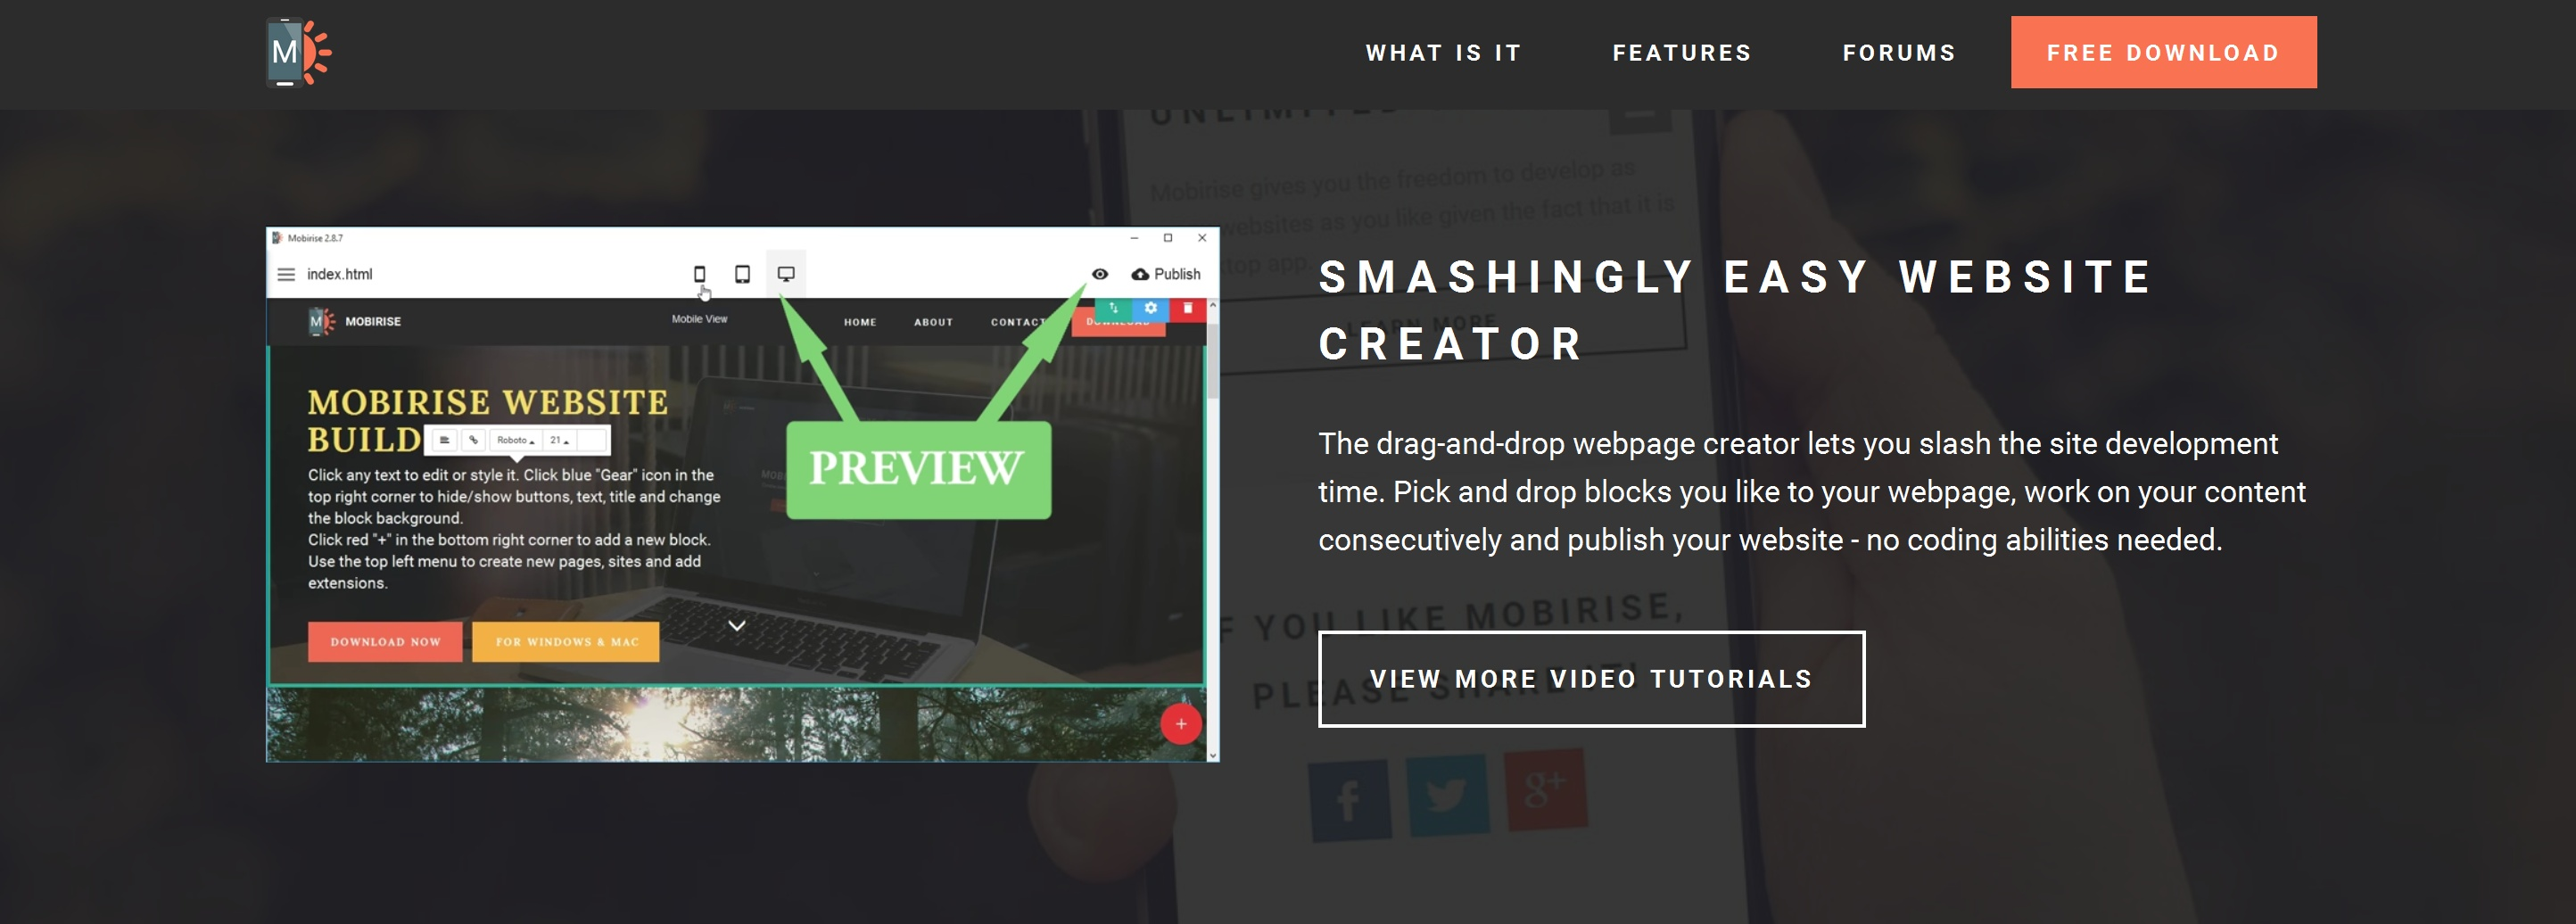 Free and Simple Website Creator Tool